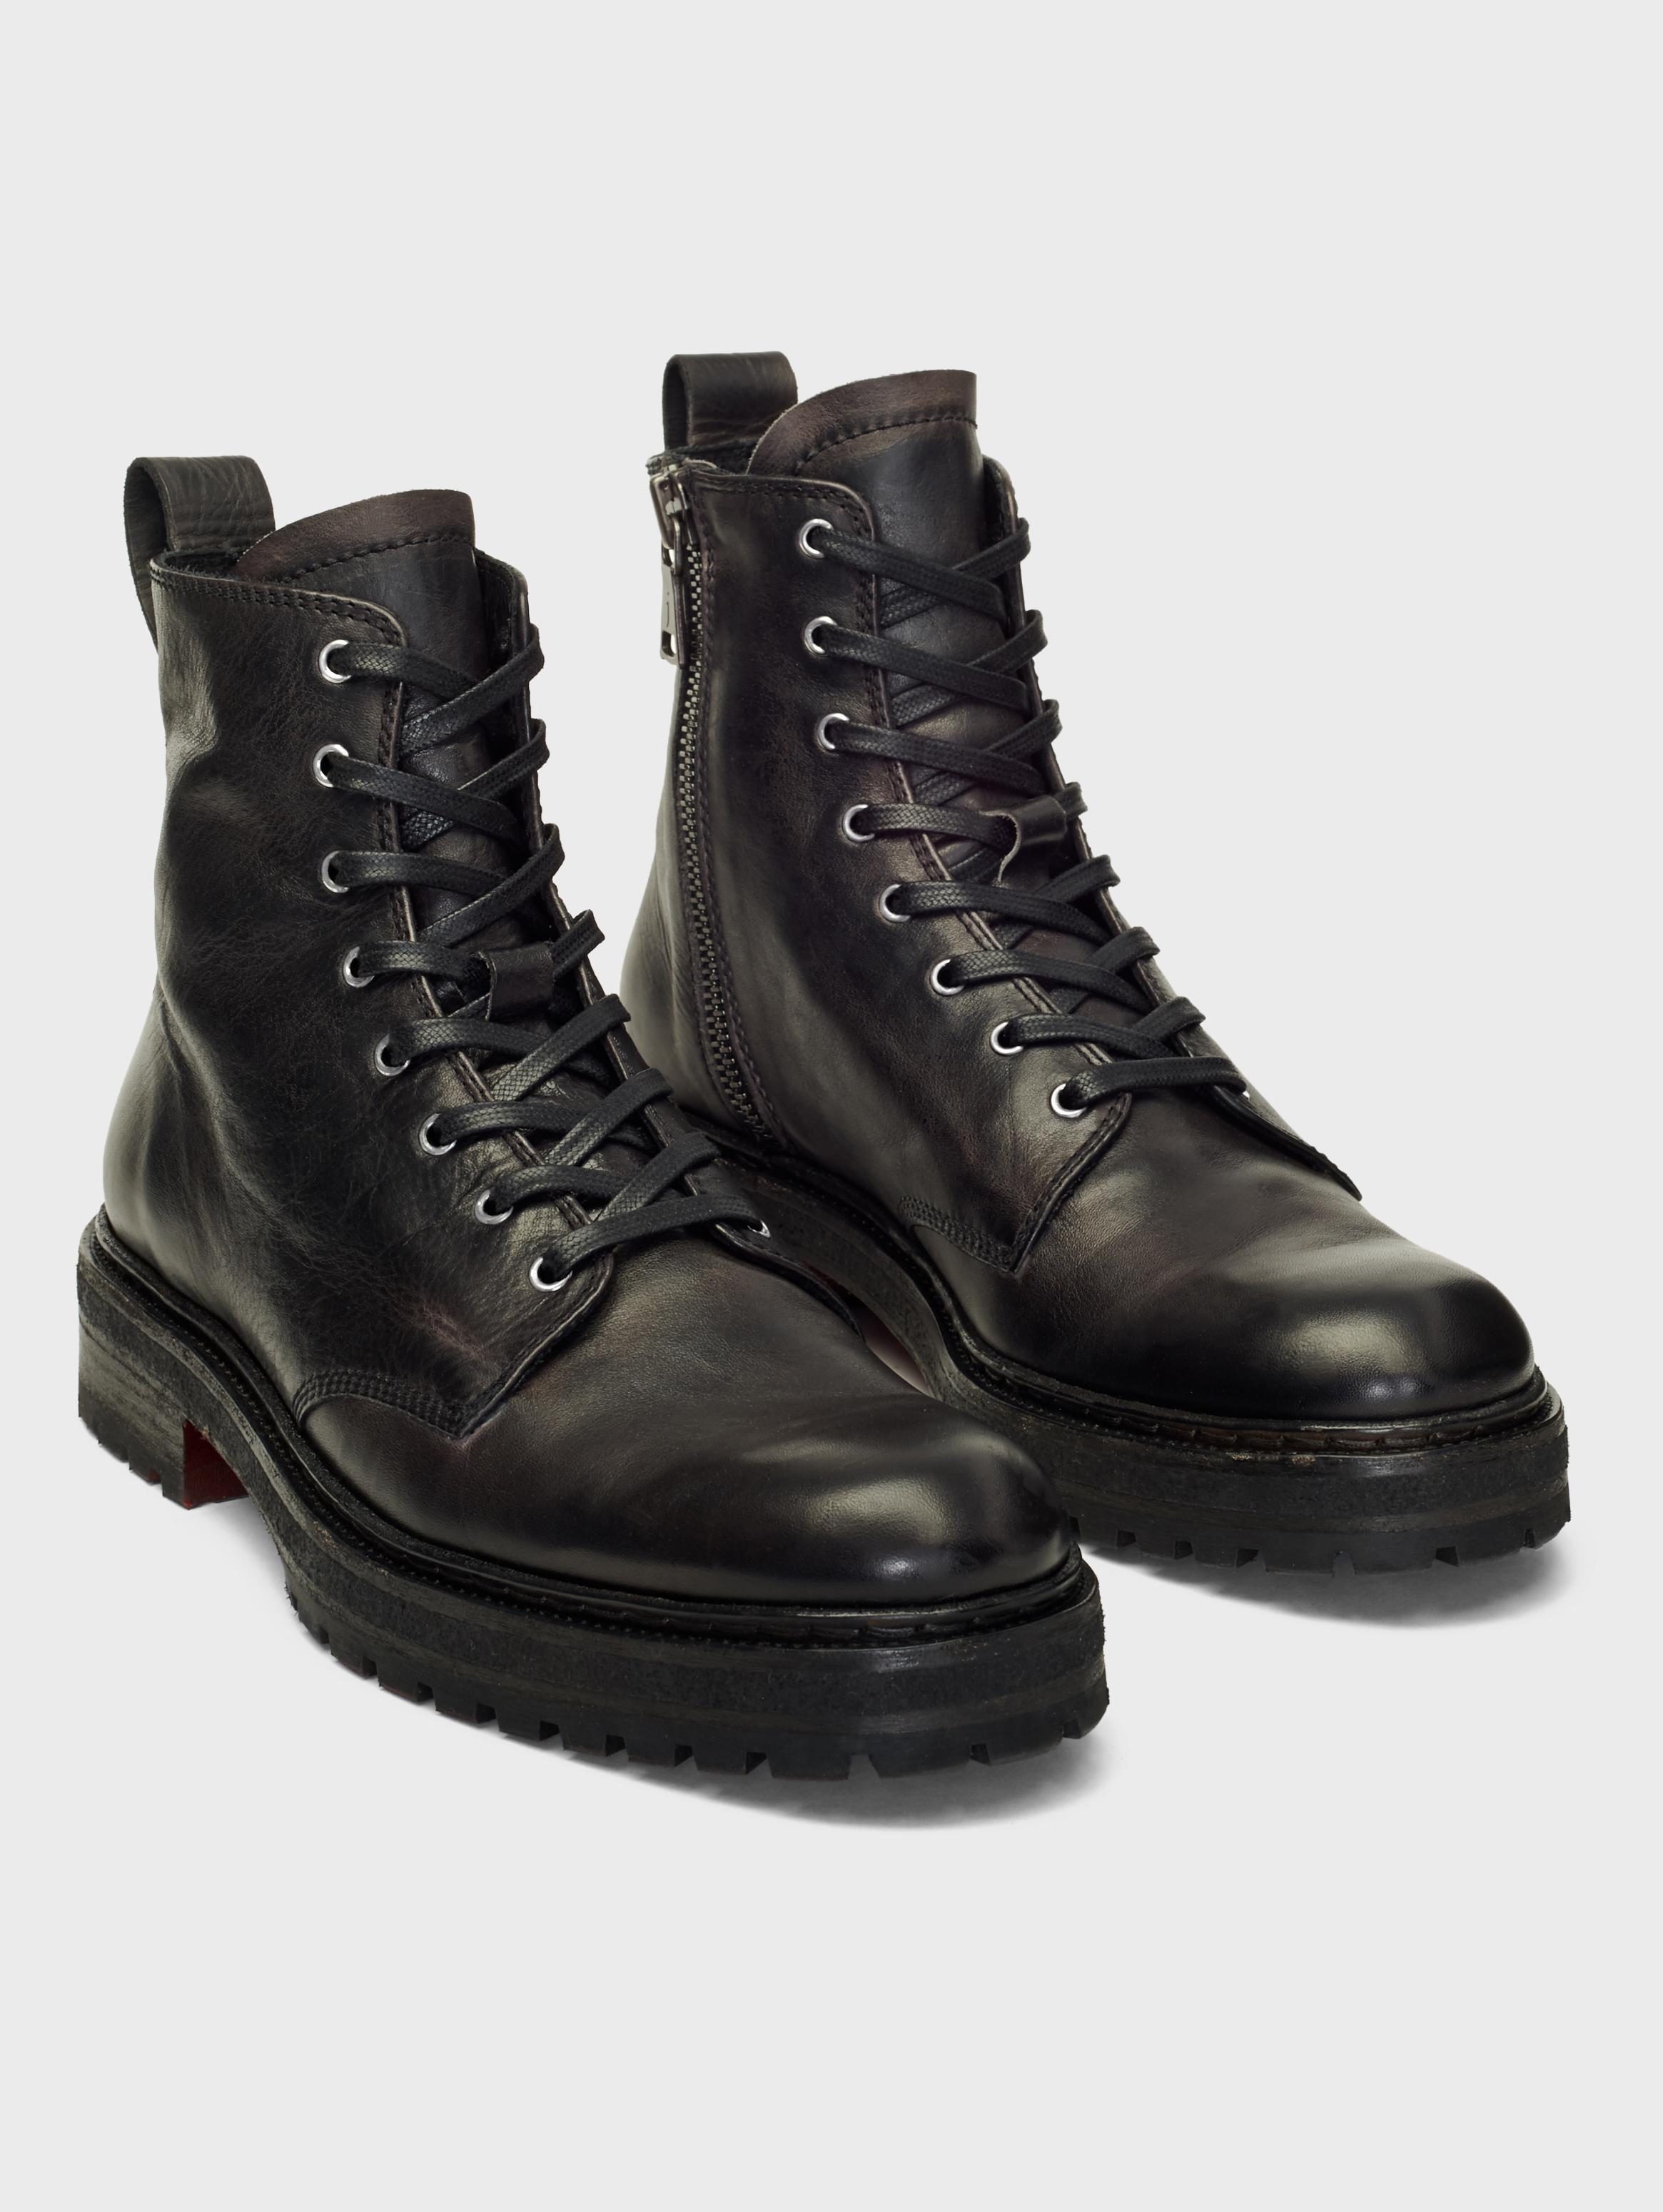 John Varvatos Union Combat Boots Black